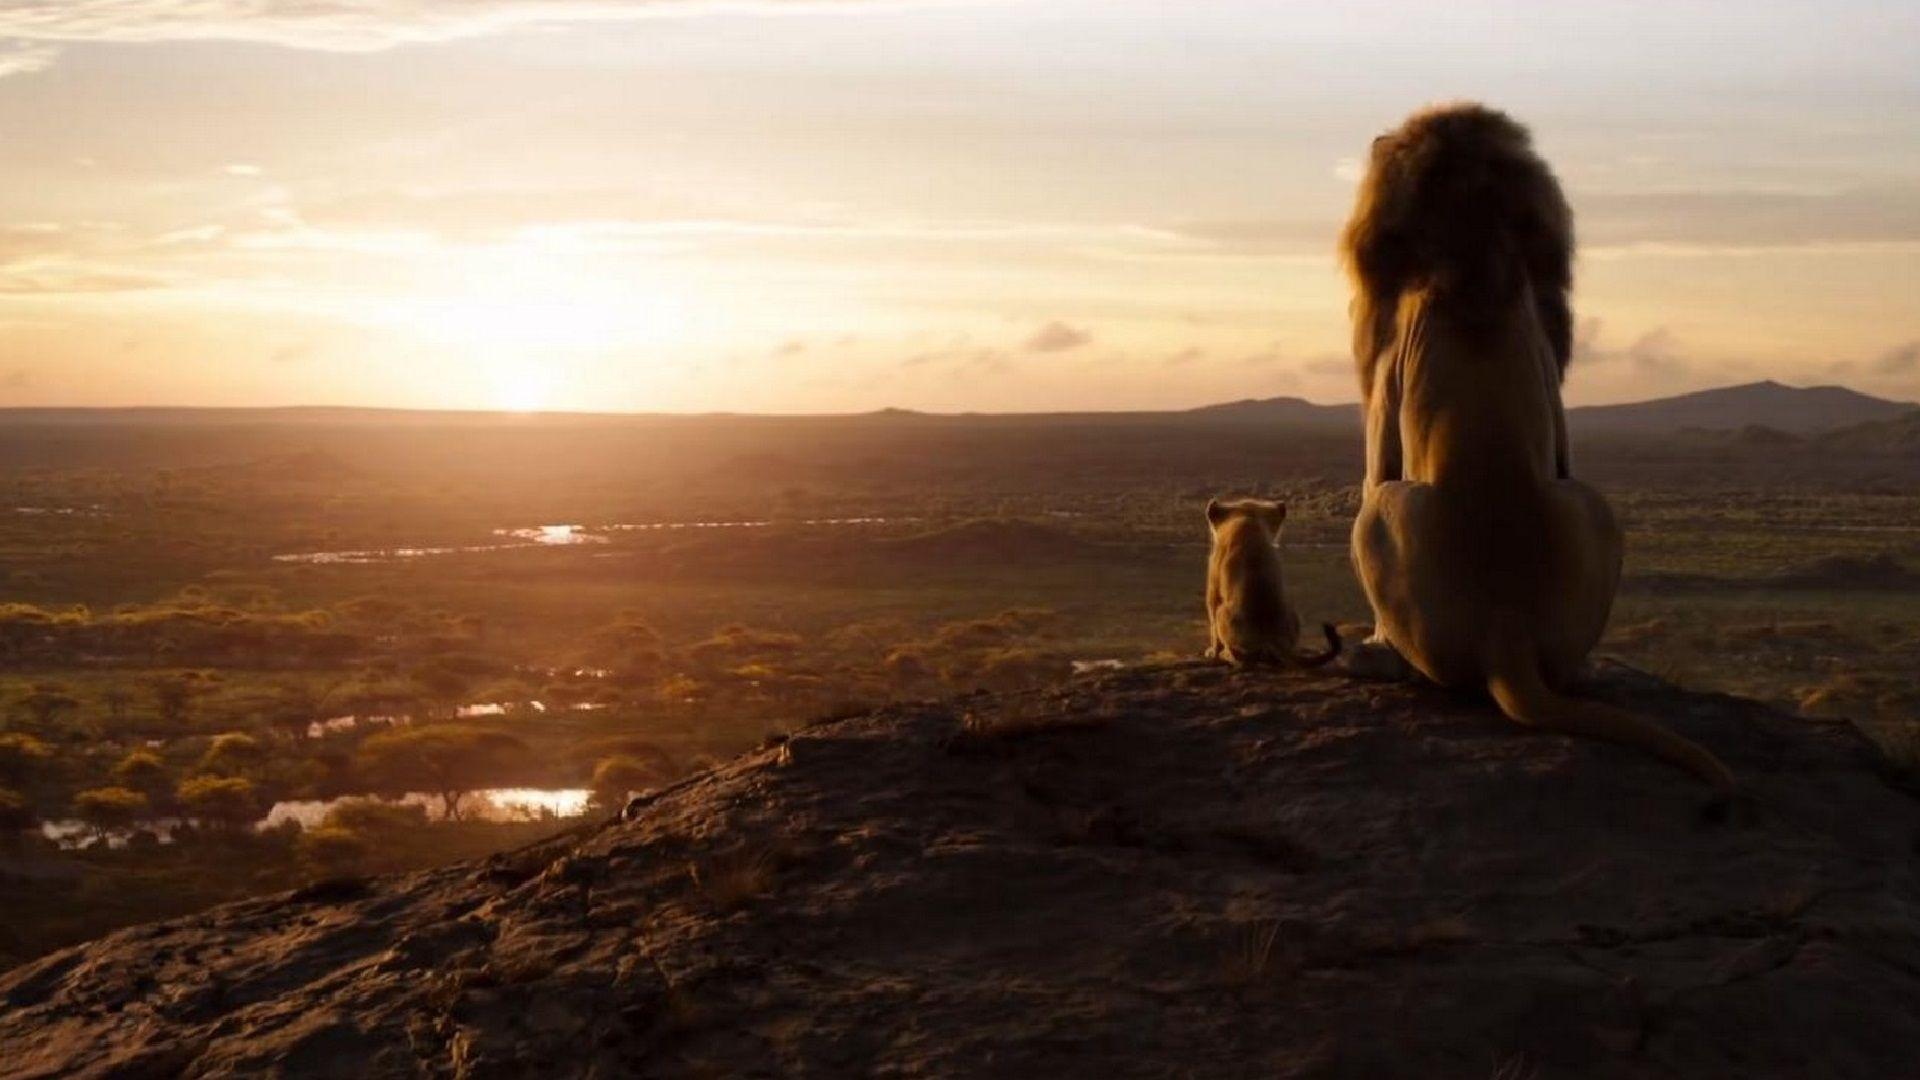 The Lion King 2019 Wallpaper Best Movie Poster Wallpaper